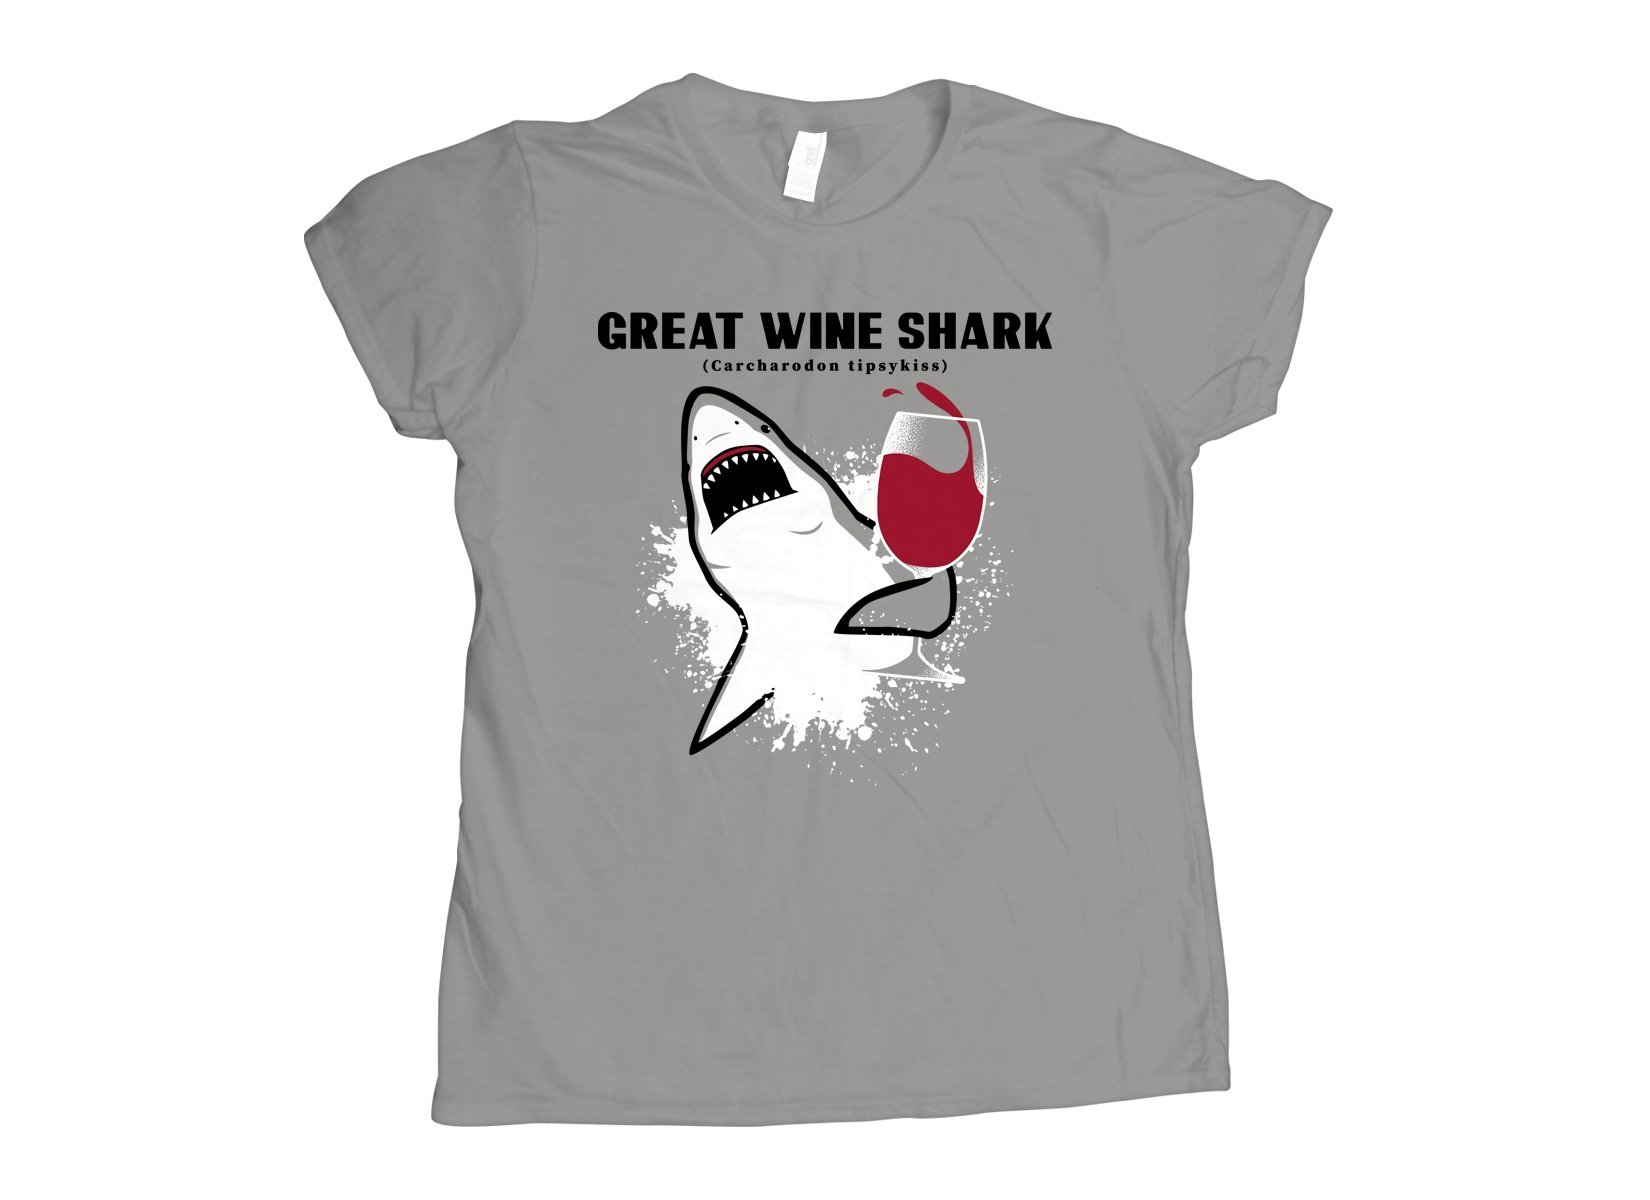 Great Wine Shark on Womens T-Shirt